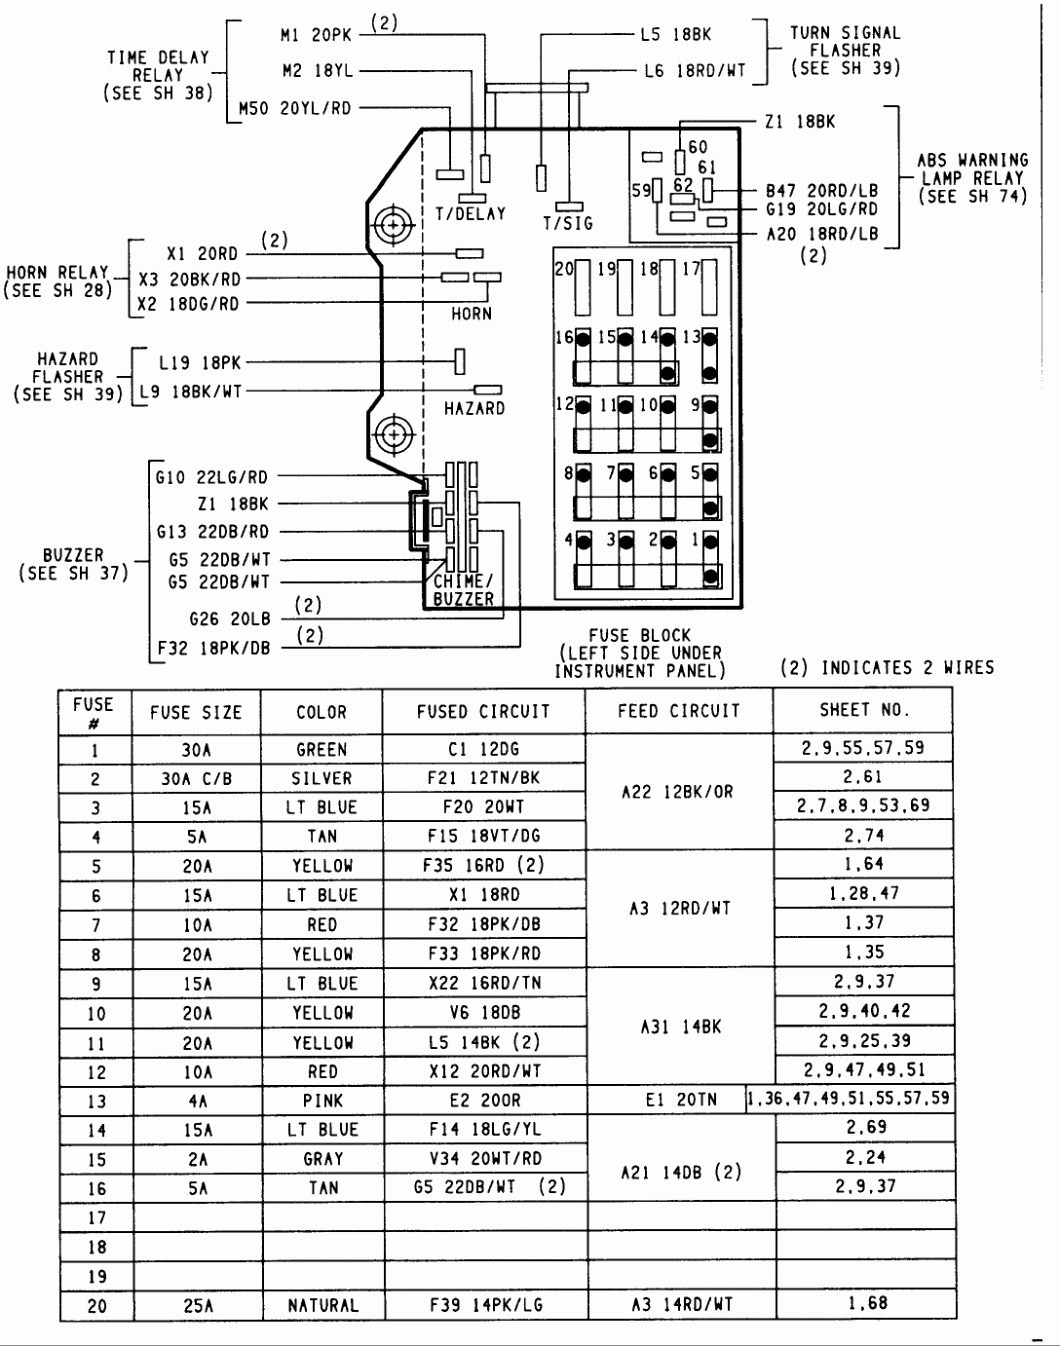 [DIAGRAM_1JK]  Fuse Box For Dodge Charger 2007 - gain.04alucard.seblock.de   Fuse Box For 2007 Dodge Charger      Diagram Source